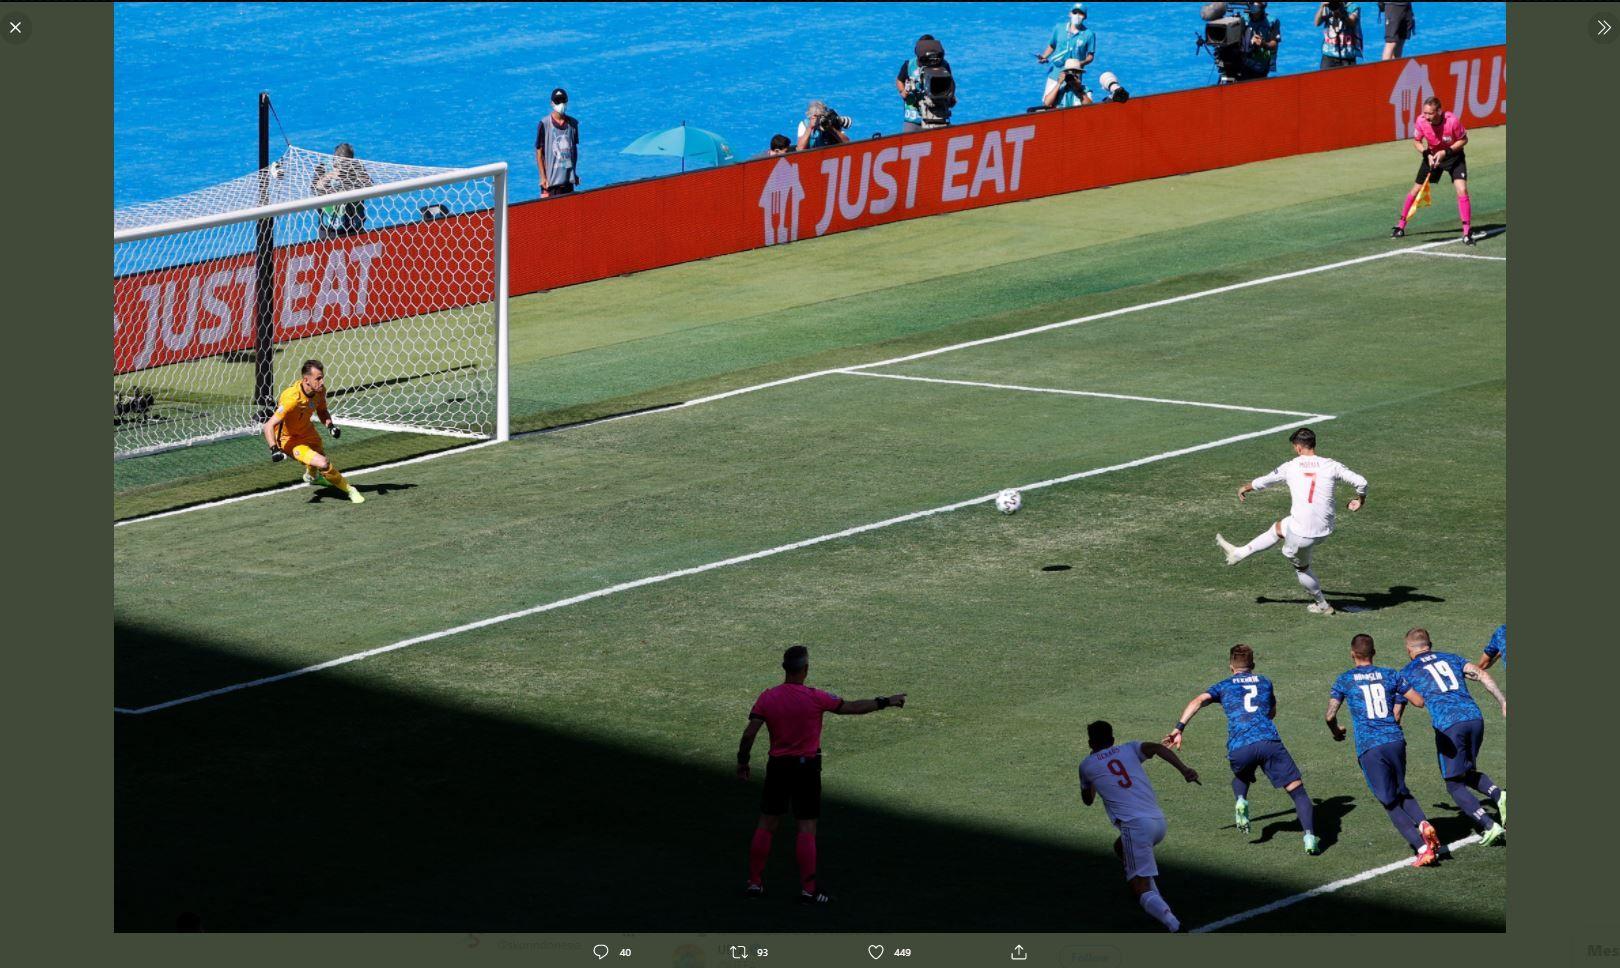 Penyerang timnas Spanyol, Alvaro Mortata, gagal mengeksekusi tendangan penalti ke gawang Slowakia yang dikawal Martin Dubravka di Piala Eropa 2020 (Euro 2020).